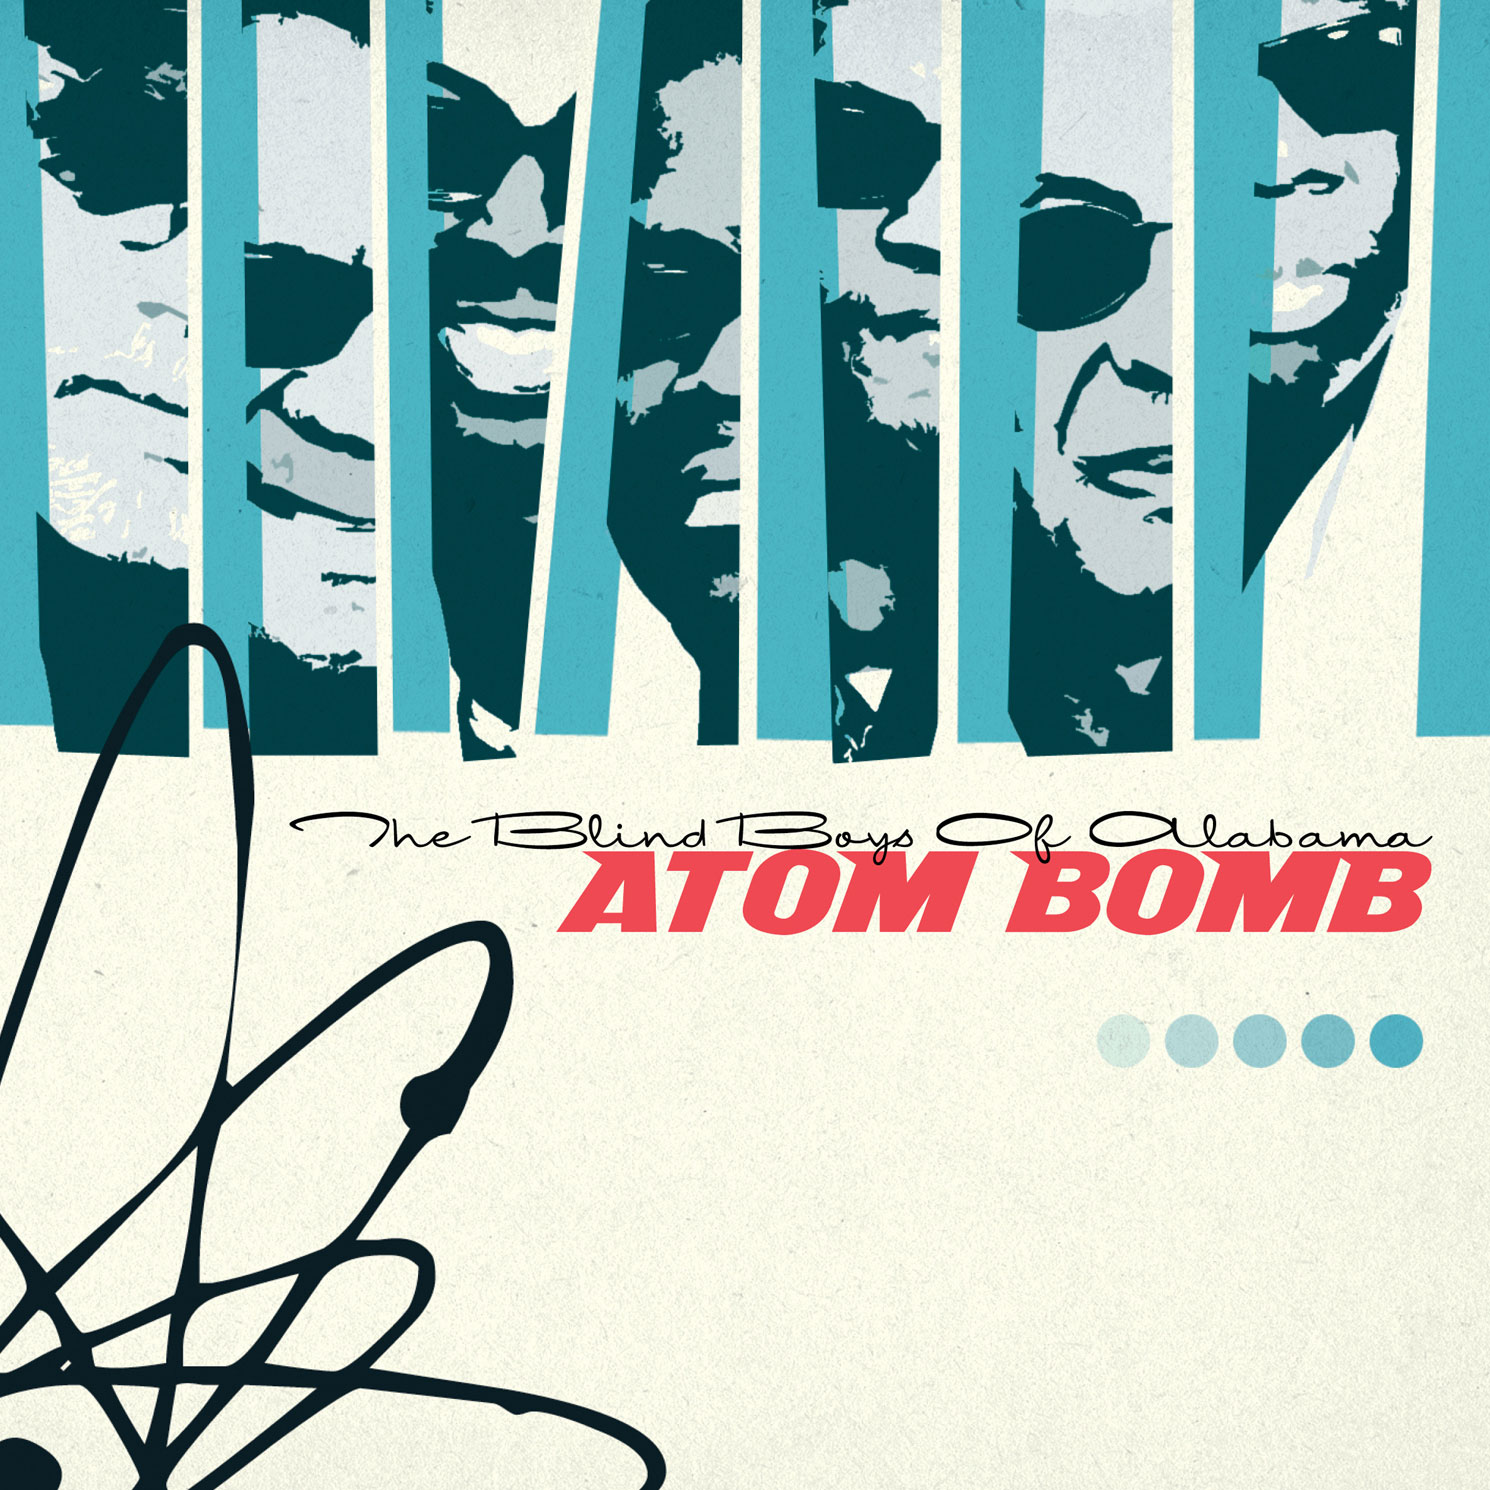 The Blind Boys of Alabama-Atom Bomb  Release Date: November 4, 2016 Label: Omnivore Recordings  SERVICE: Restoration, Mastering (Bonus tracks) NUMBER OF DISCS: 1 GENRE: Gospel FORMAT: CD